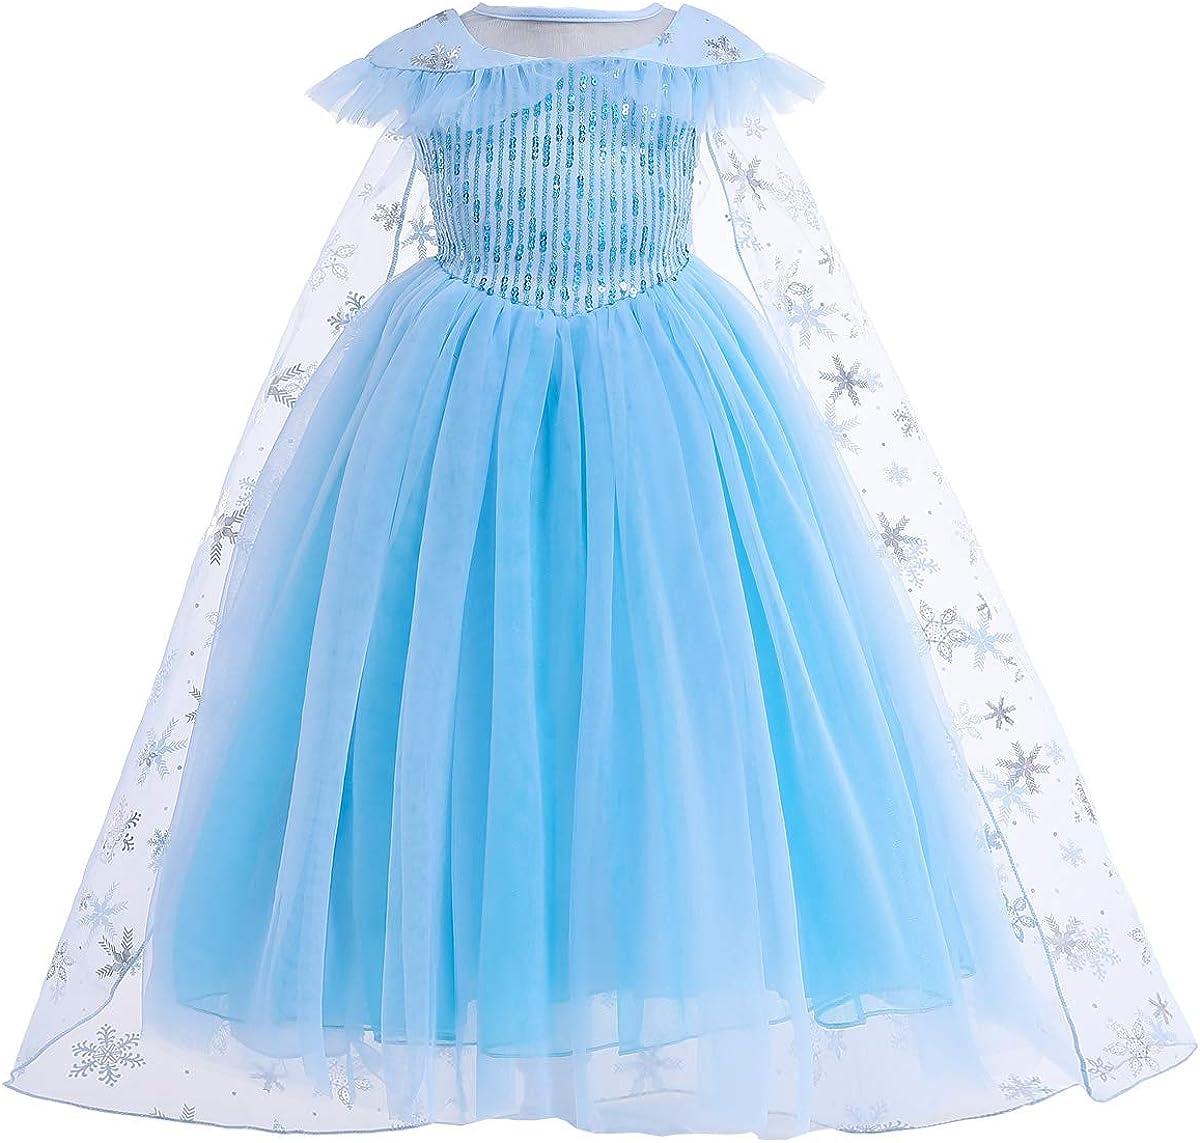 Girls Snow Queen Ranking TOP11 Princess Dress Costumes with Sequins Popular overseas Sn Dresses